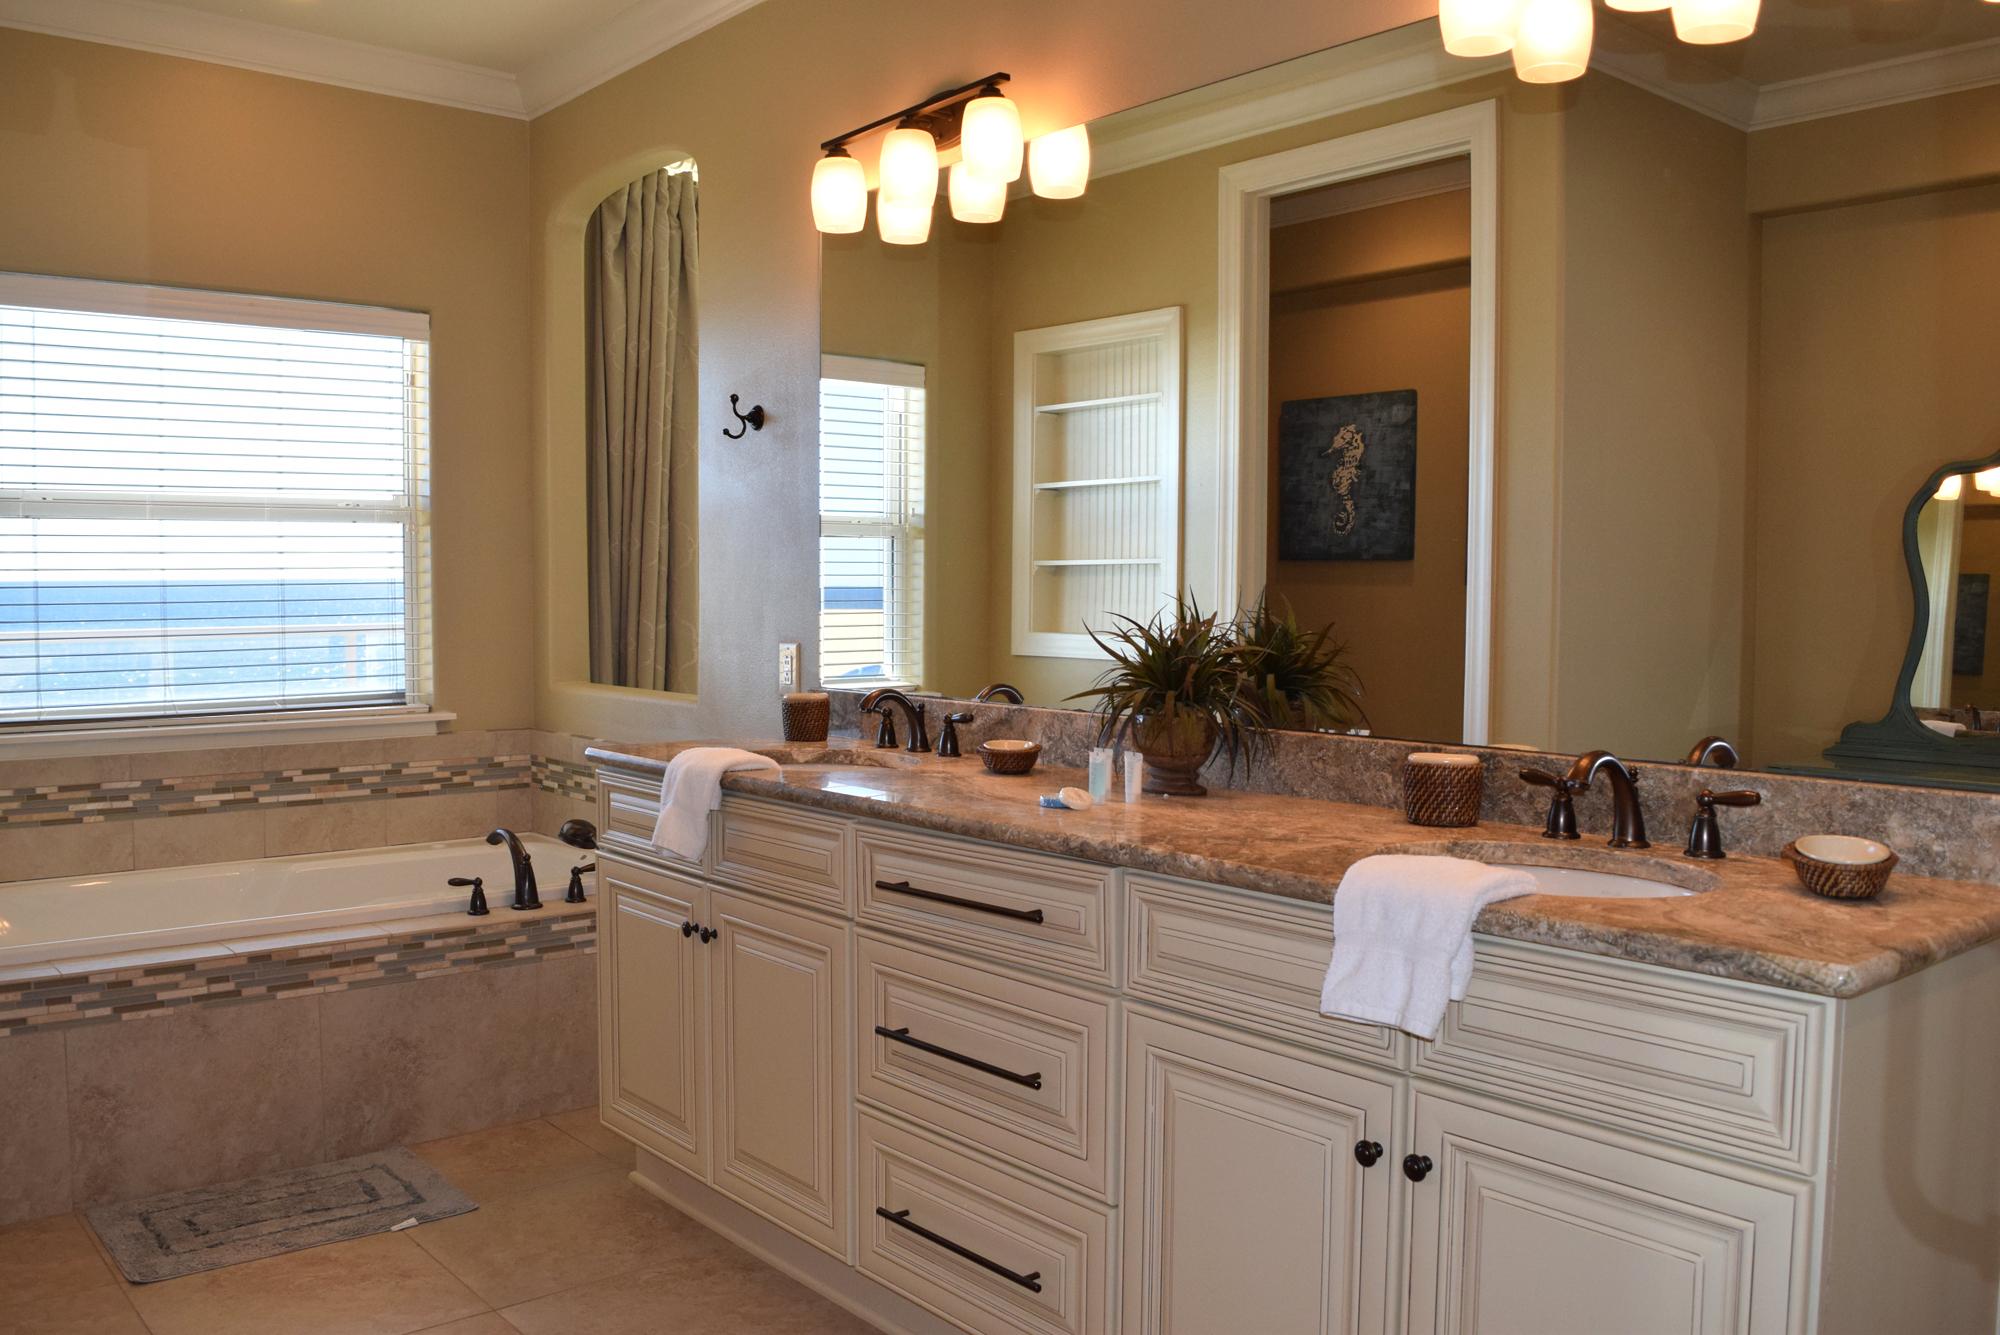 Regency Cabanas #B1 Condo rental in Regency Cabanas Pensacola Beach in Pensacola Beach Florida - #19